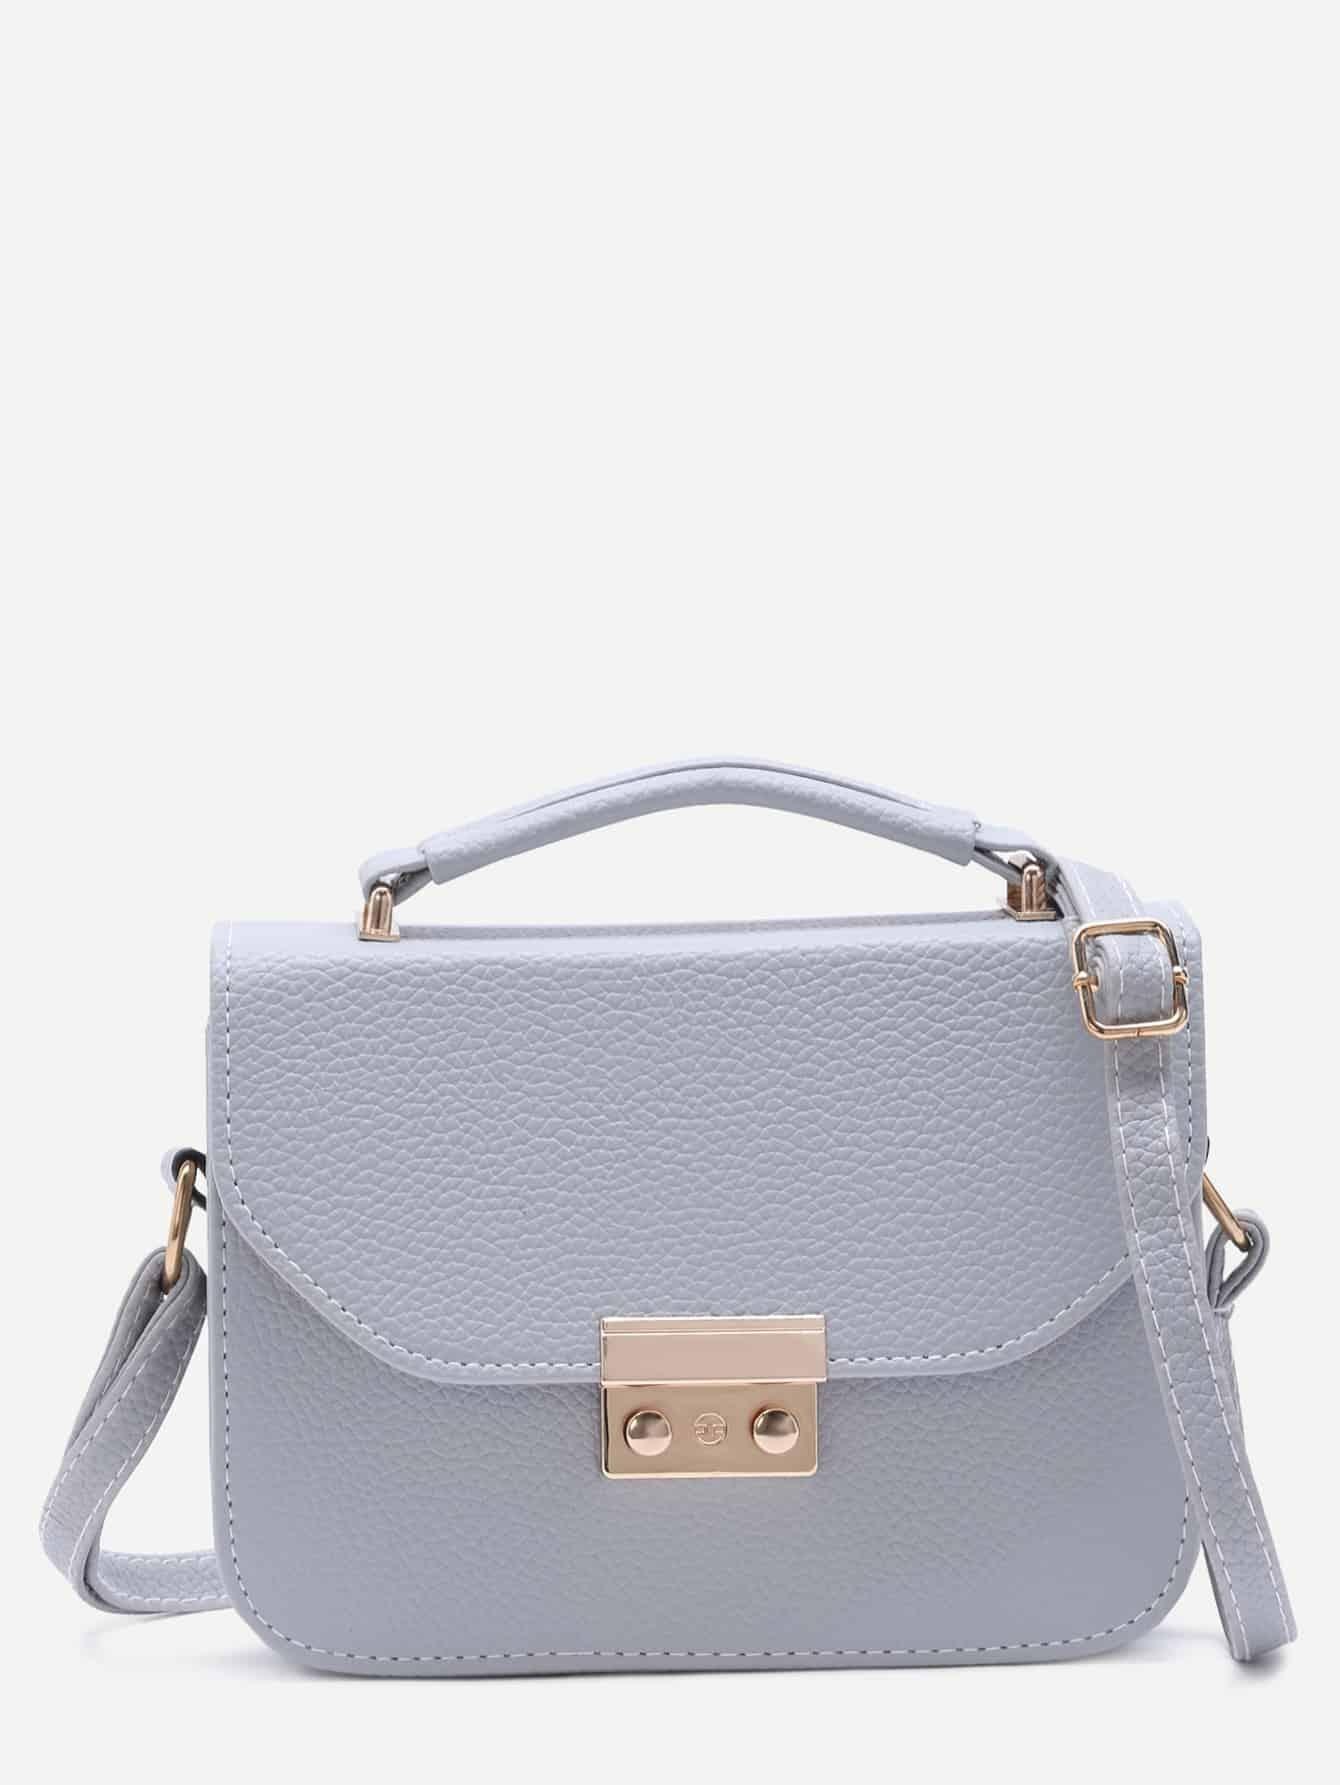 Grey Pebbled PU Box Handbag With Strap geometric design pu handbag with strap